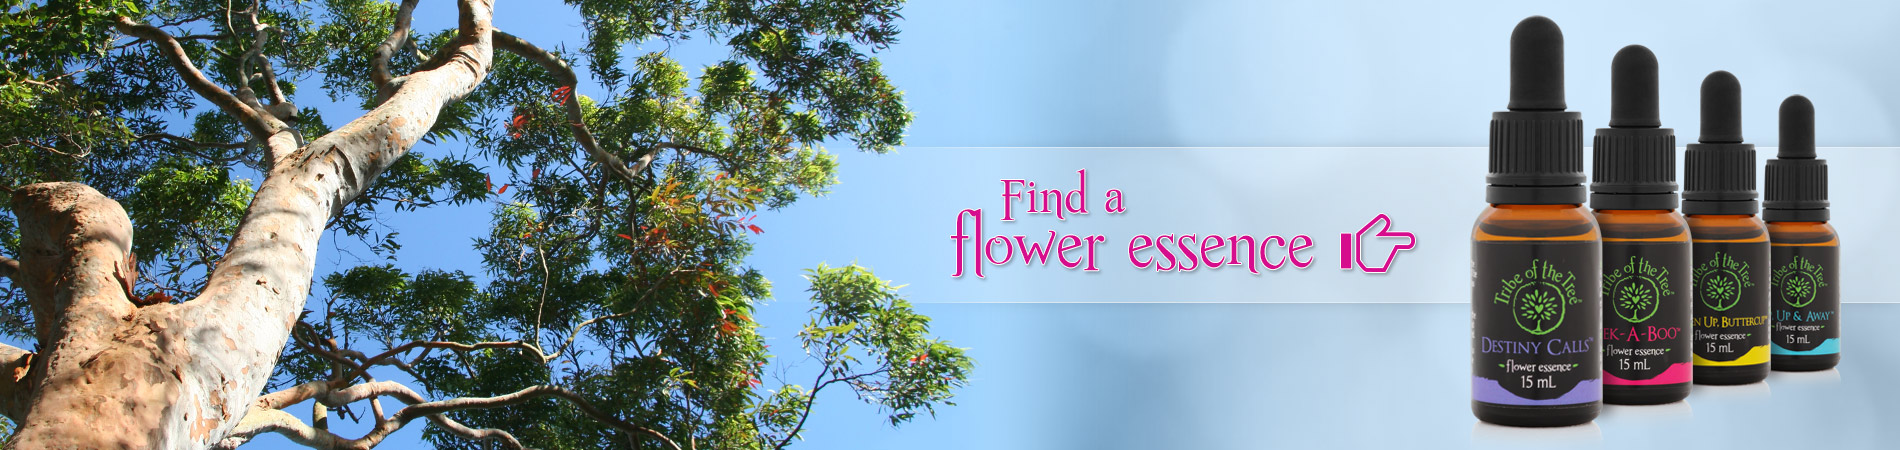 Find a Flower Essence